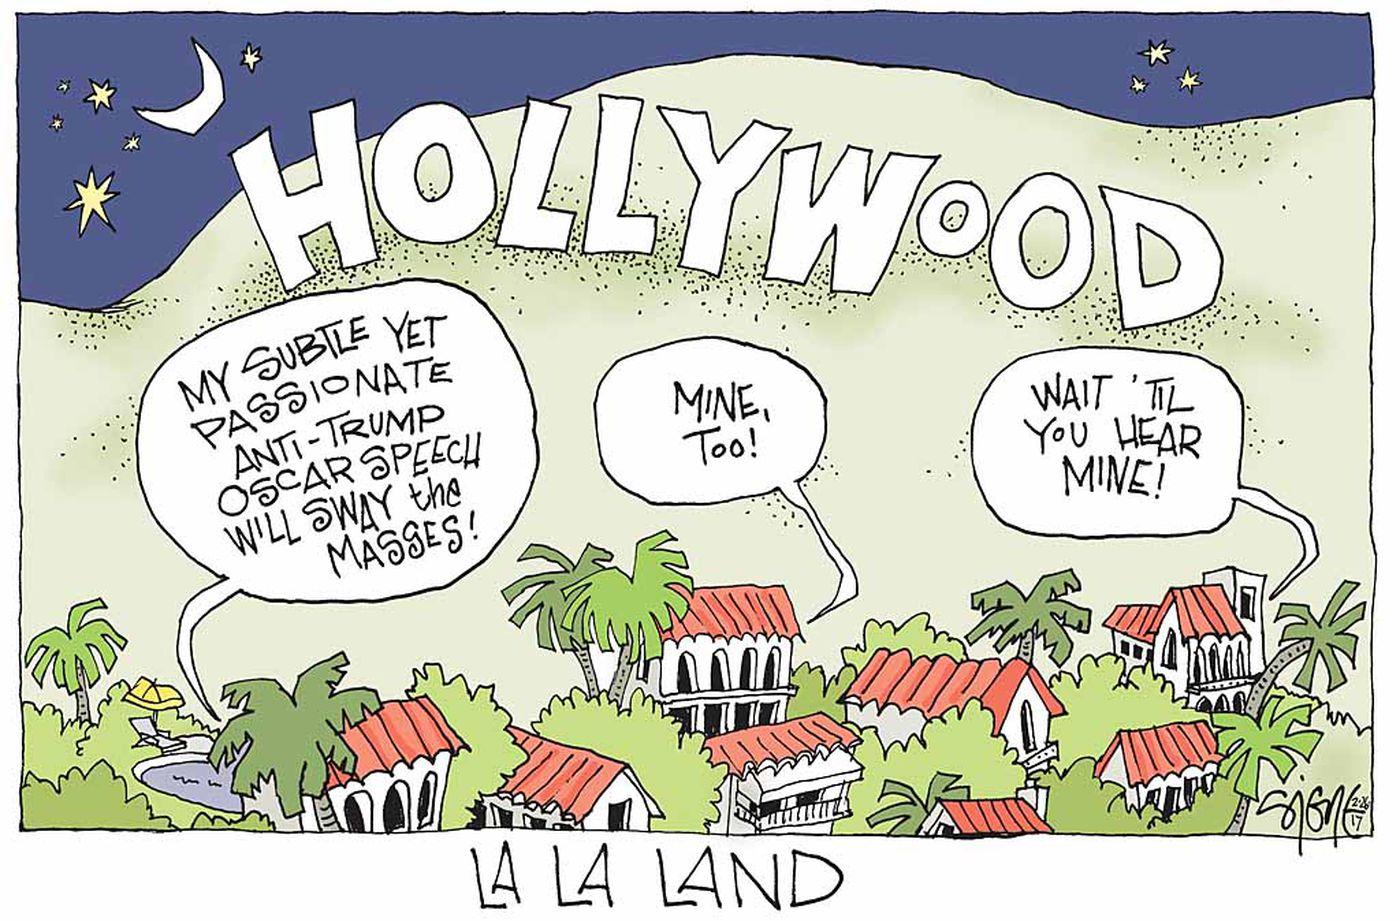 Daily Signe Cartoon 02/26/17